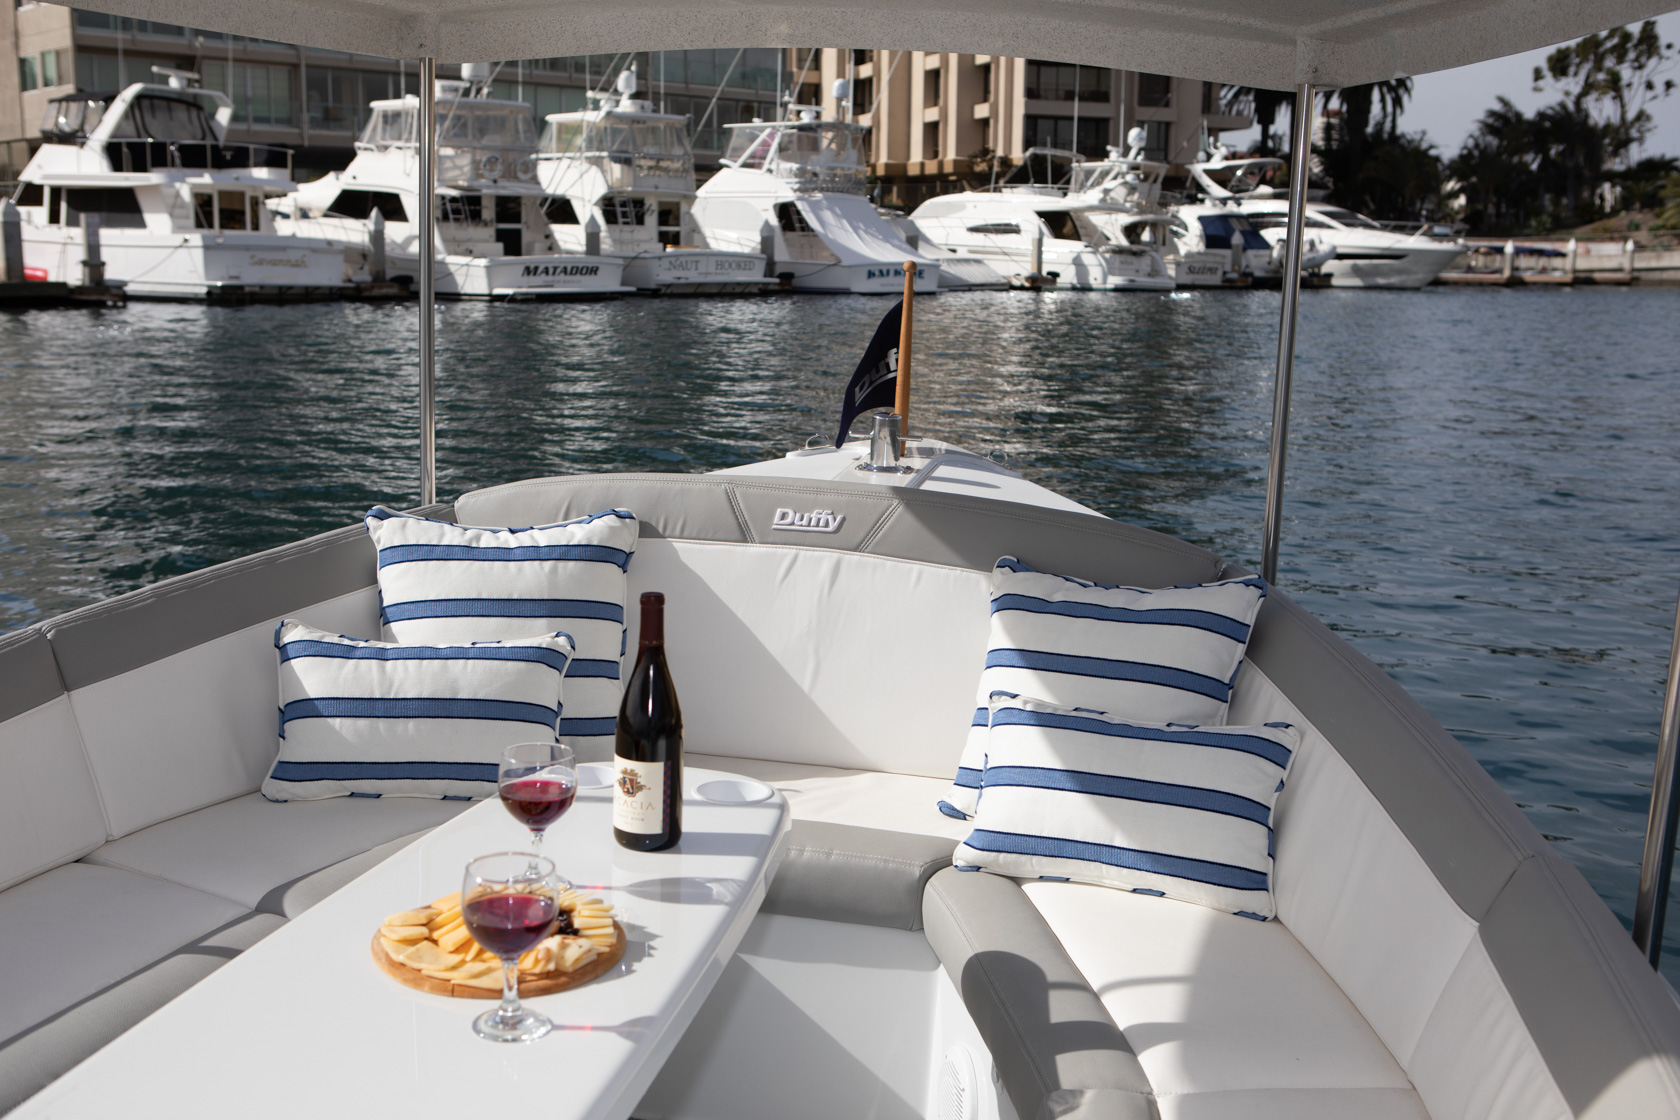 Duffy-Electric-Boats-Bayshore-18-Interior-v1-5